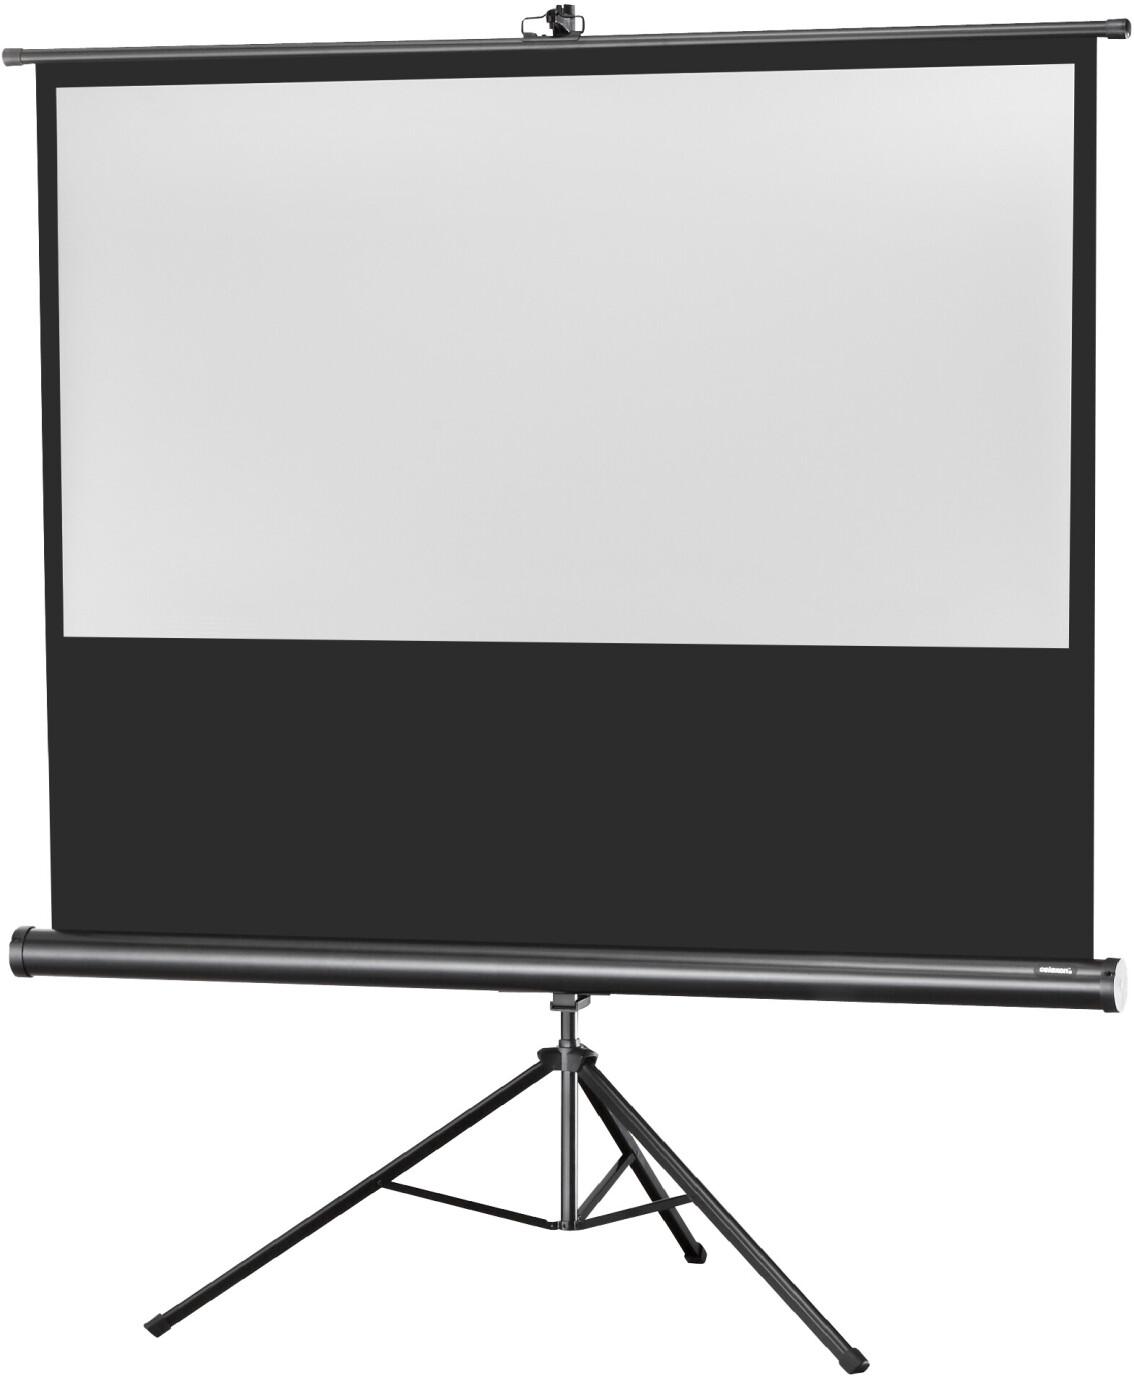 celexon Stativleinwand Economy 133 x 75 cm